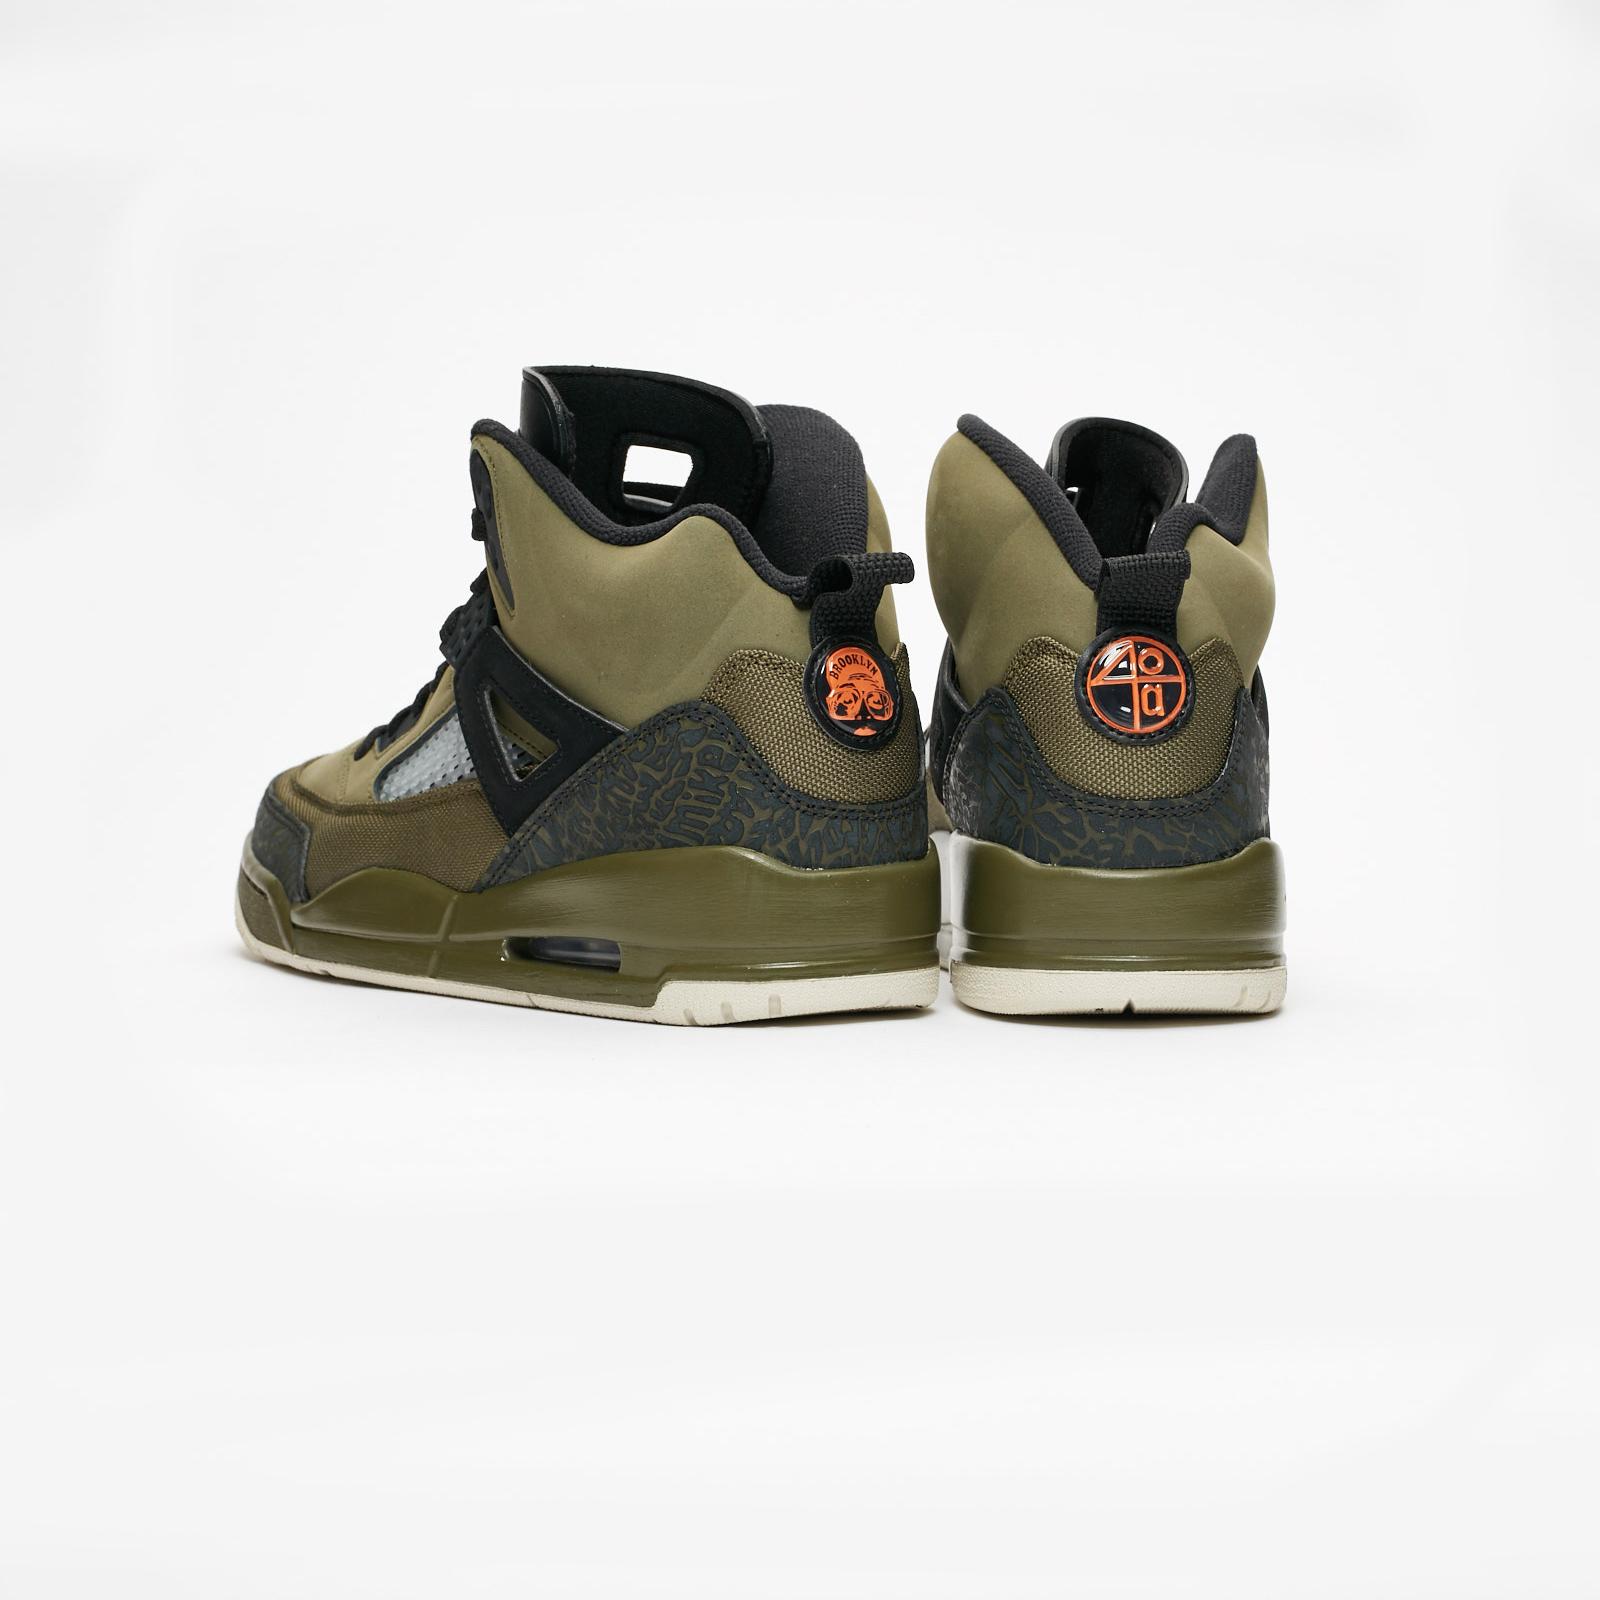 1628280b15be9f Jordan Brand Jordan Spizike - 315371-300 - Sneakersnstuff